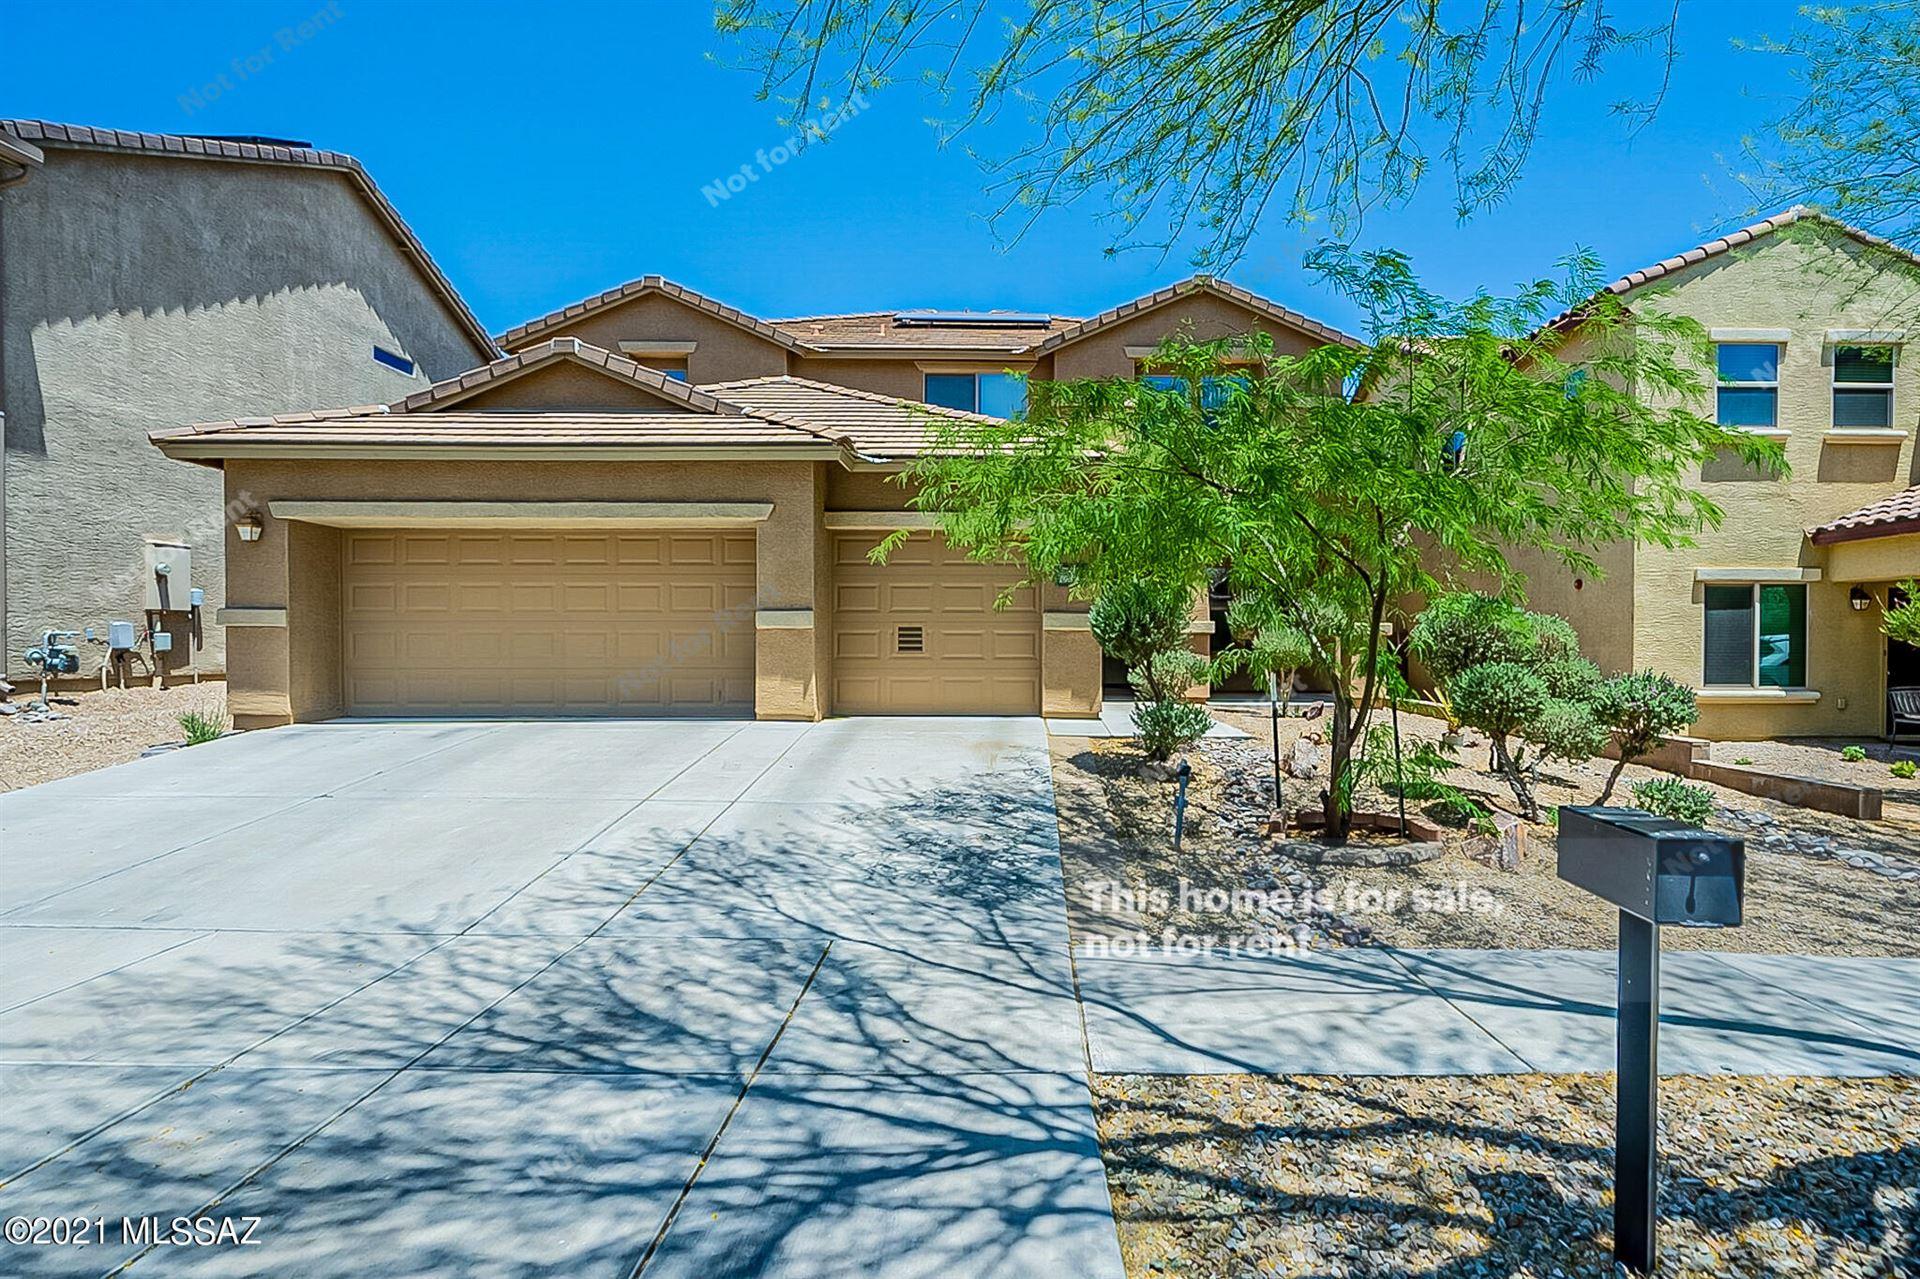 10805 E Salsabila Road, Tucson, AZ 85747 - MLS#: 22114410